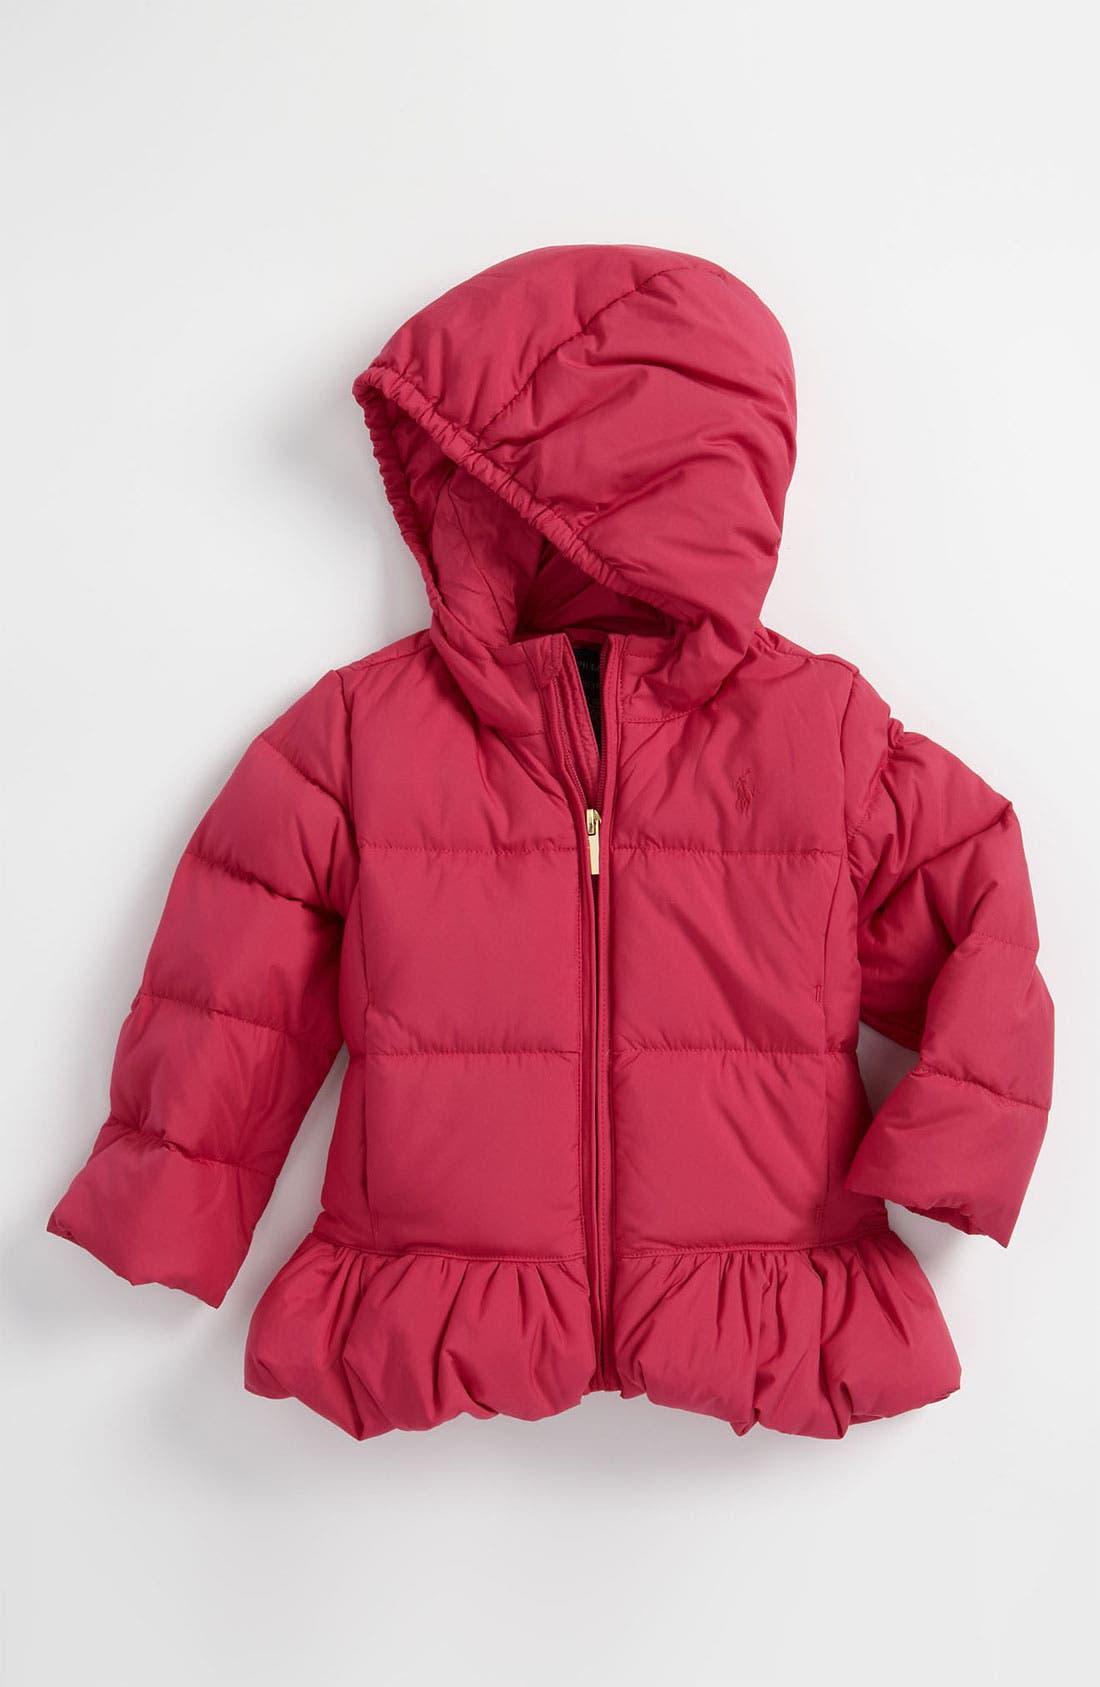 Alternate Image 1 Selected - Ralph Lauren Hooded Down Puffer Jacket (Toddler)